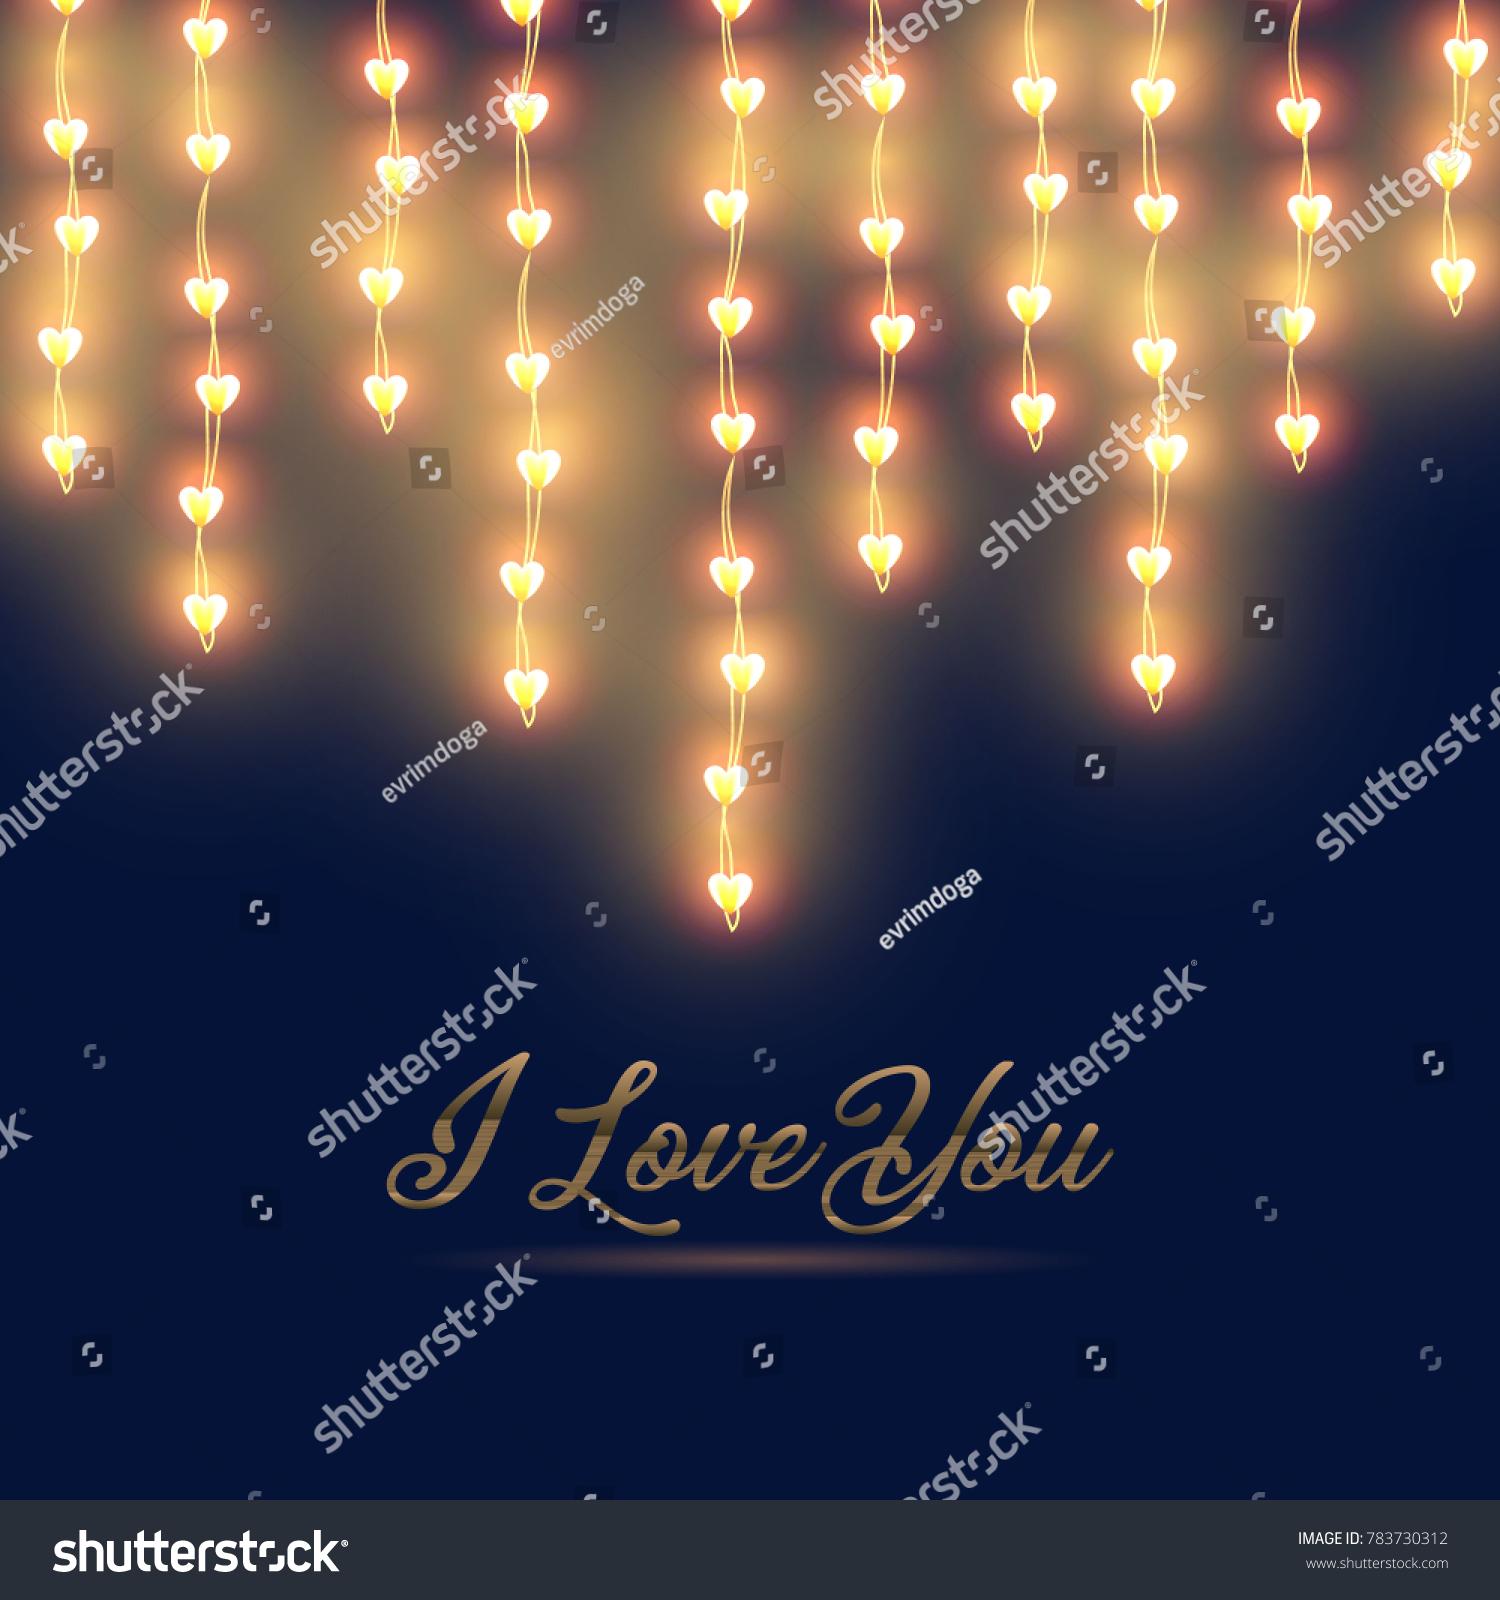 happy valentines day horizontal heart lights stock vector (royalty